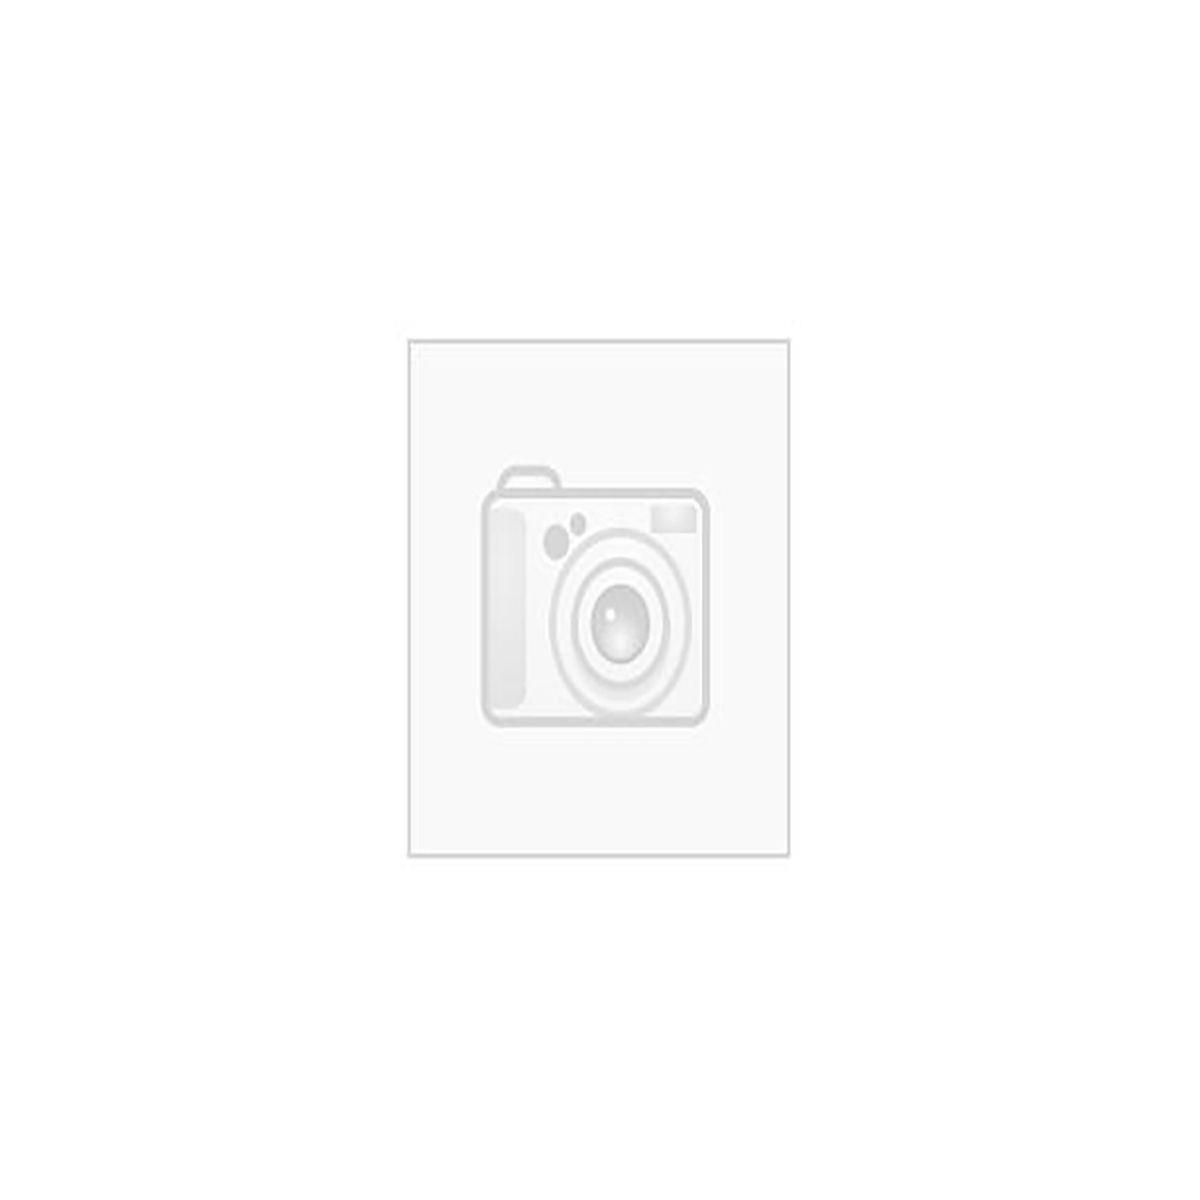 Veggskål, Me by Starck sampakke, Duravit  inkl. SoftClose sete